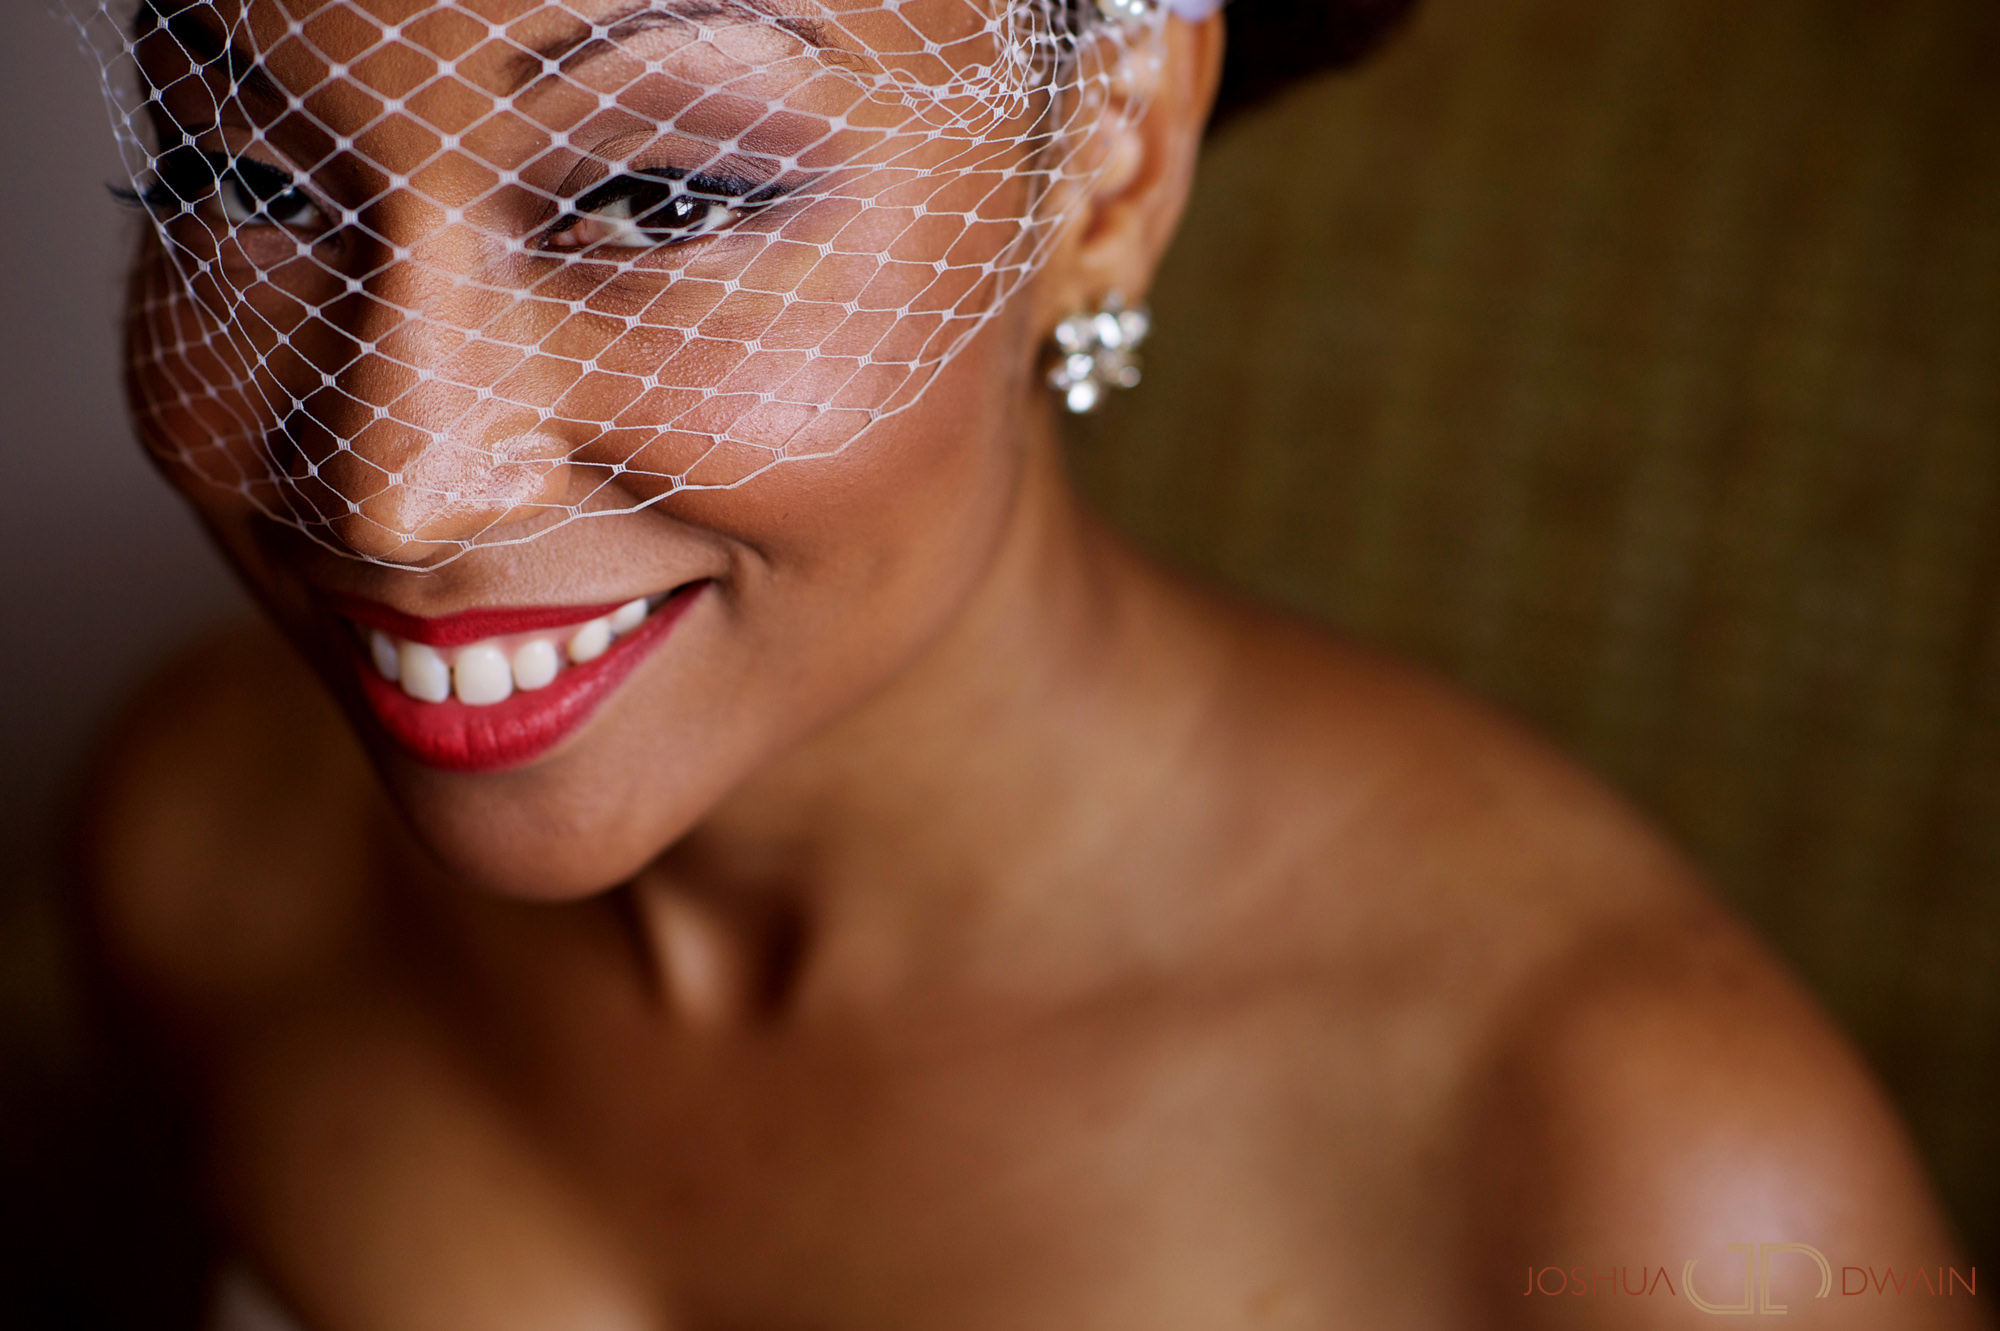 candra-alonza-005-holiday-inn-south-beach-miami-wedding-photographer-joshua-dwain-2012-07-28_ca_106